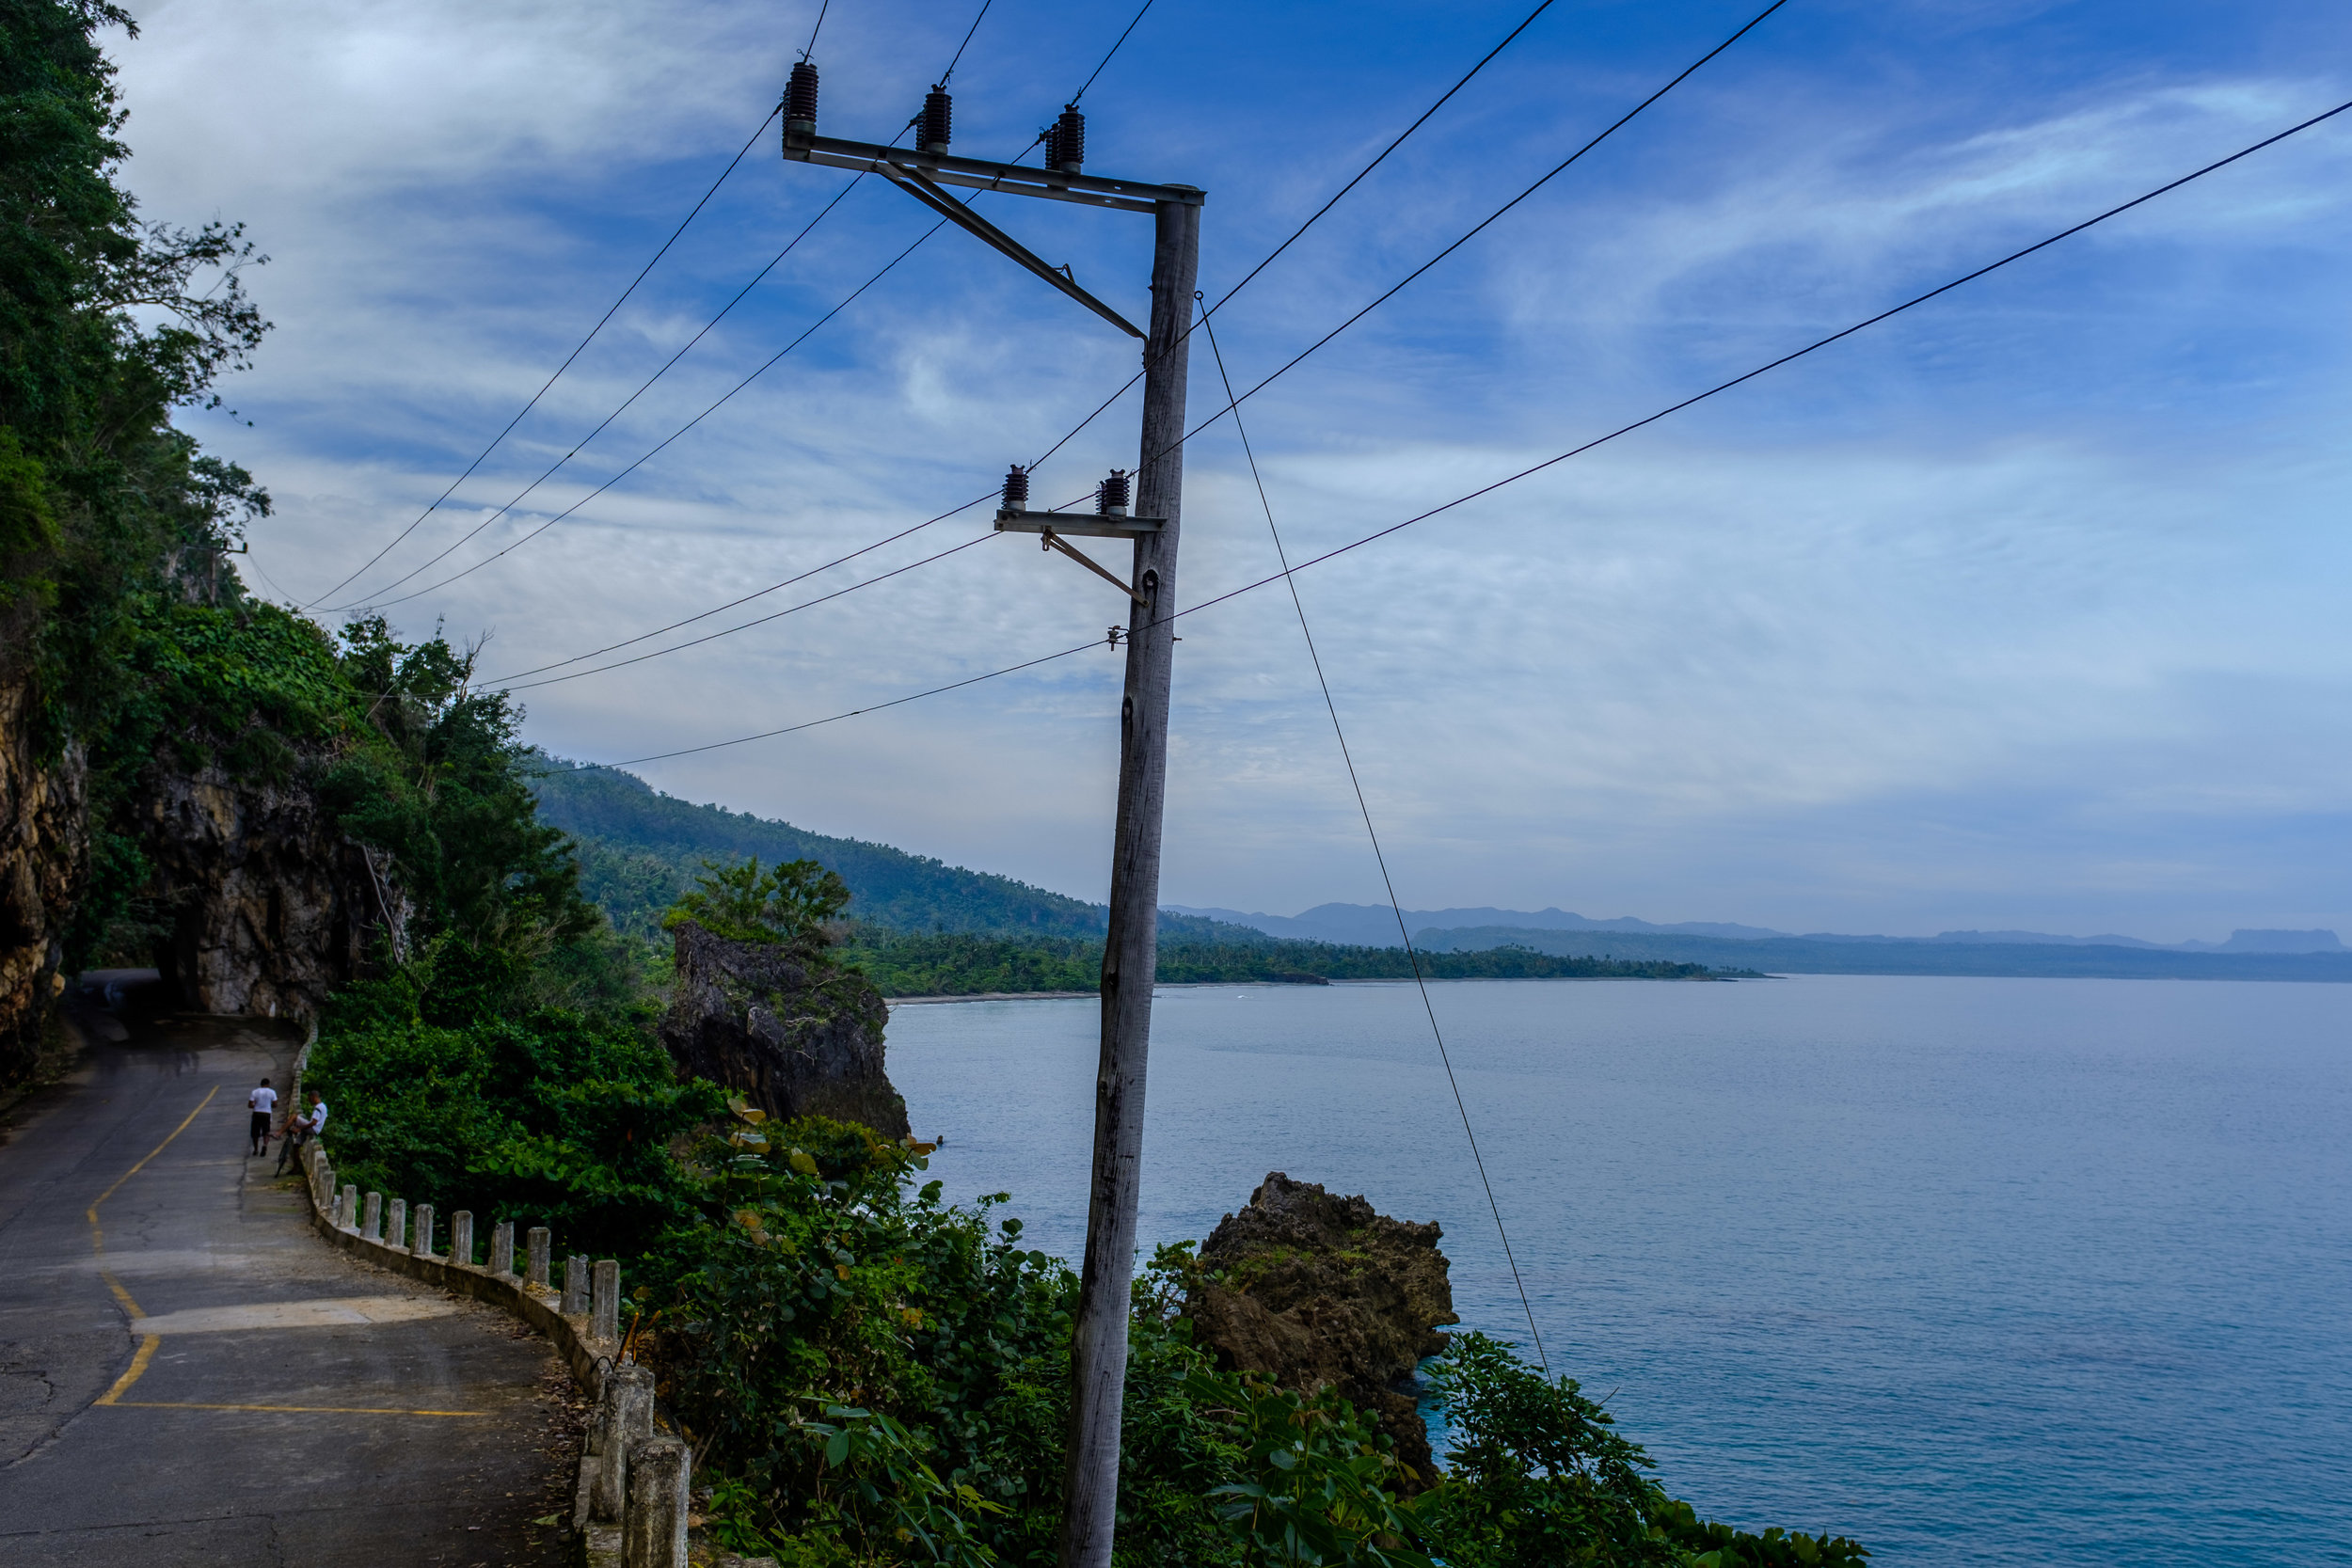 The coast near Baracoa - picture taken on Panasonic GH5